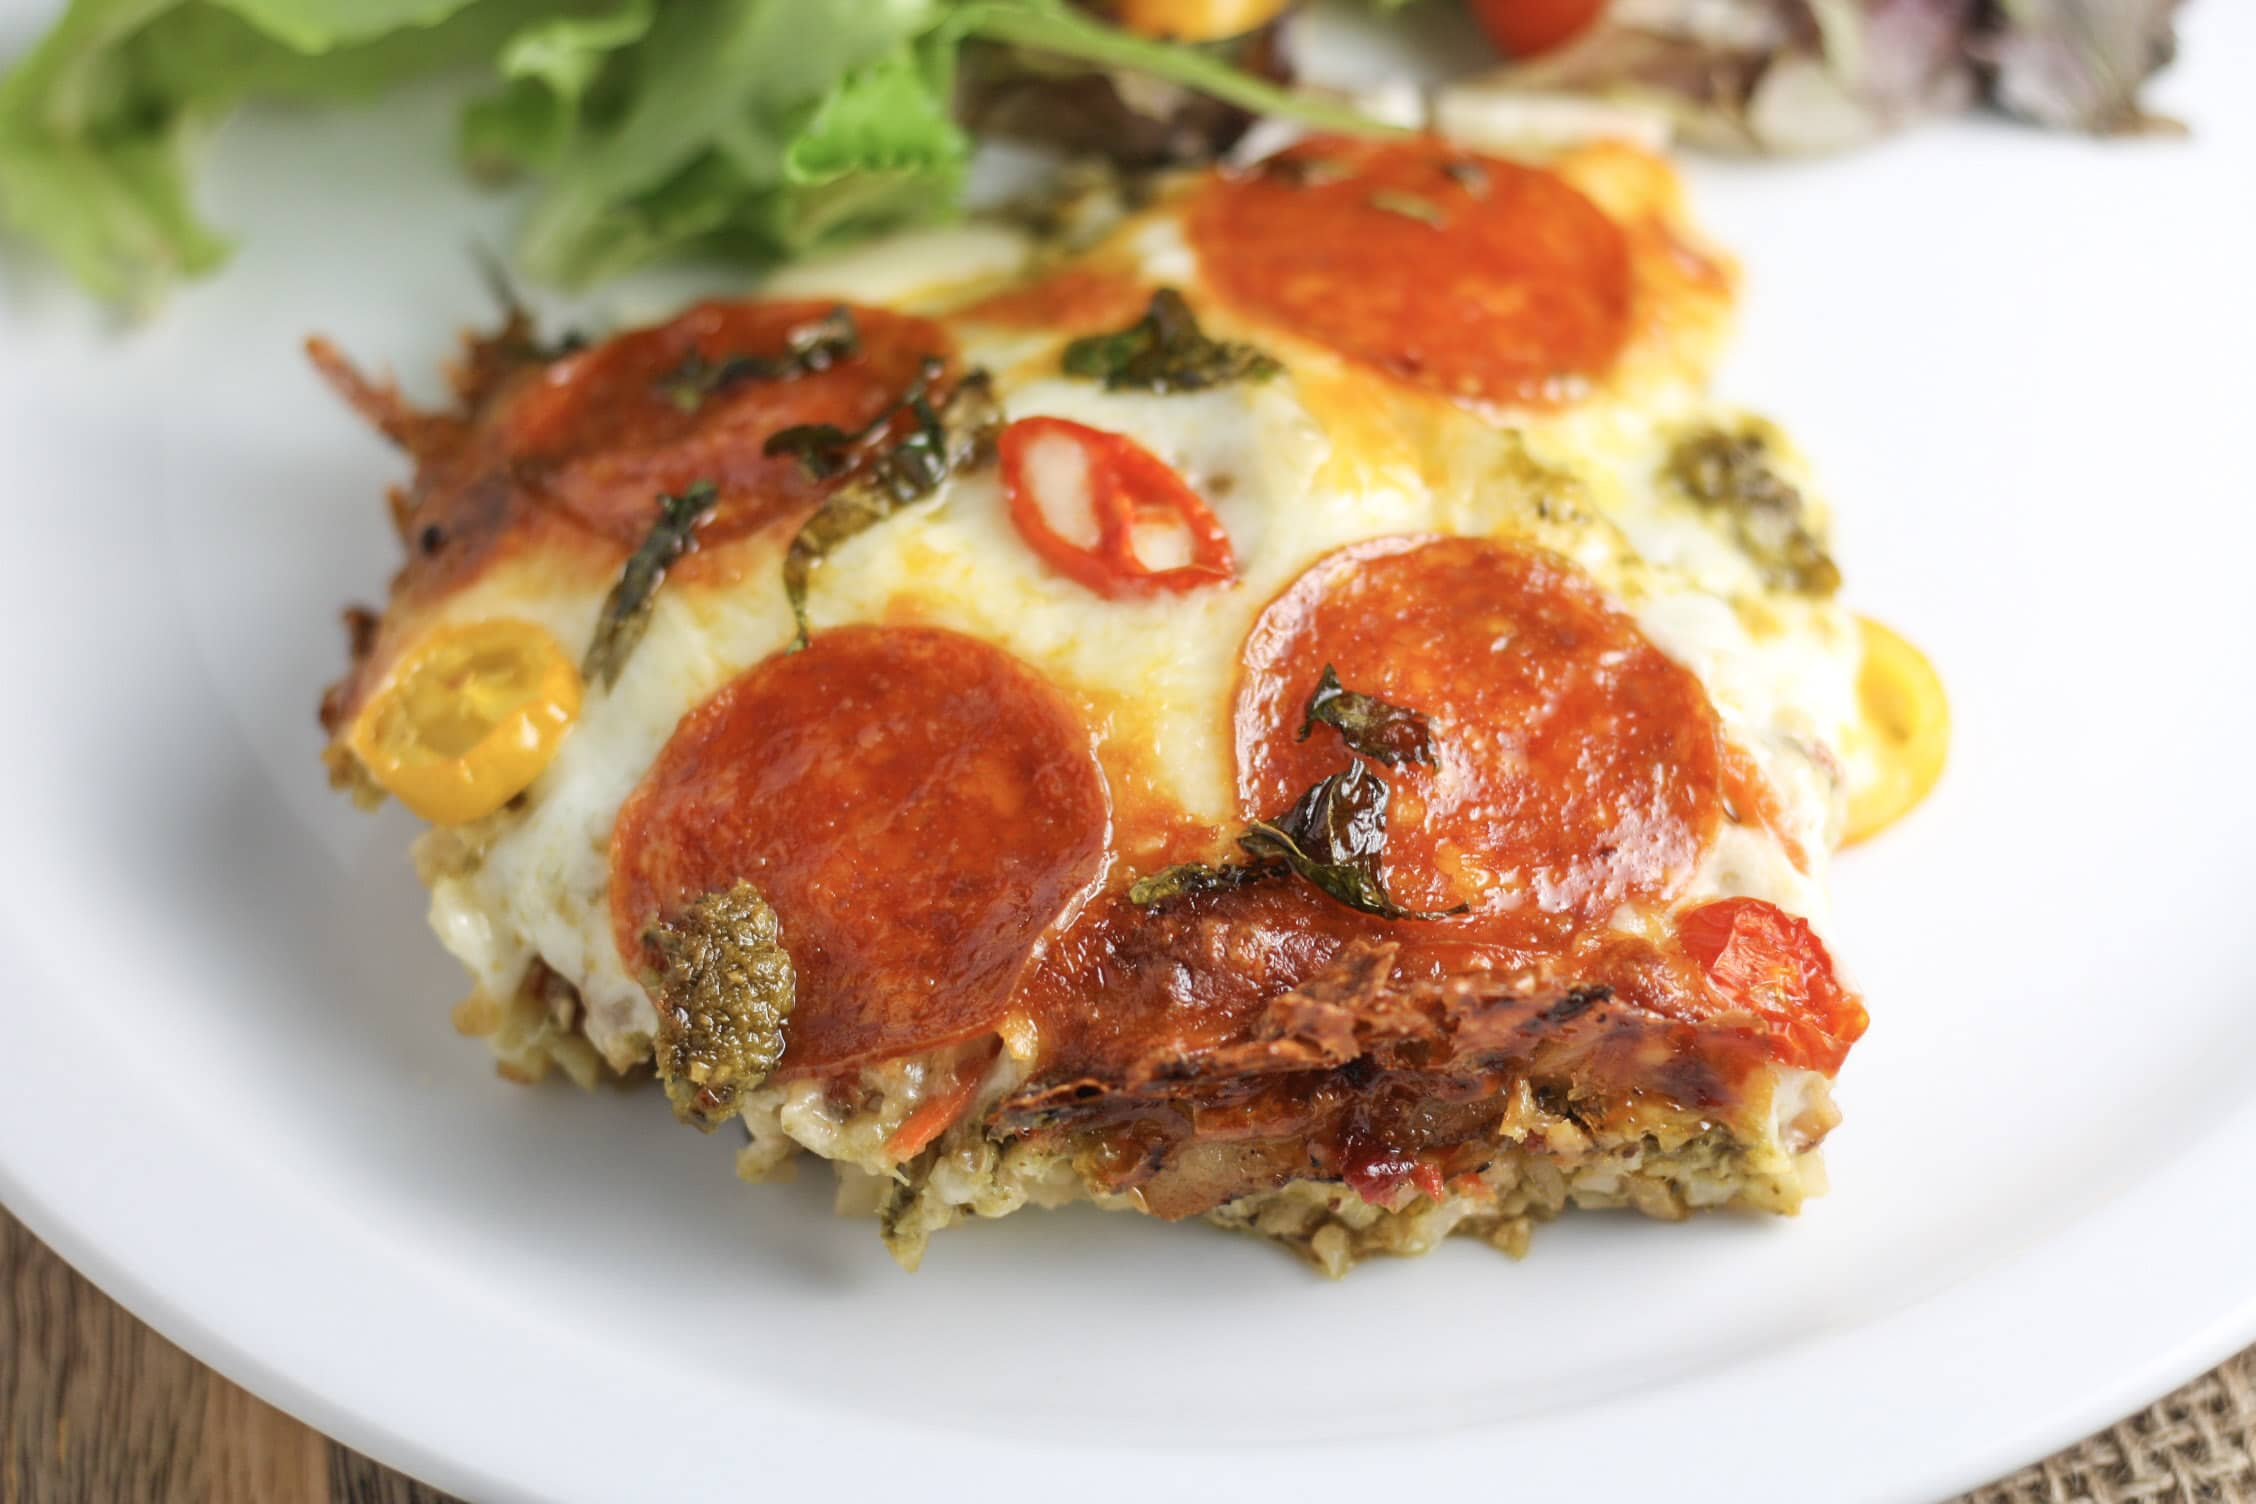 Pizza Casserole recipe | Your favorite pizza toppings in casserole form! | #keto #lowcarb | mincerepublic.com